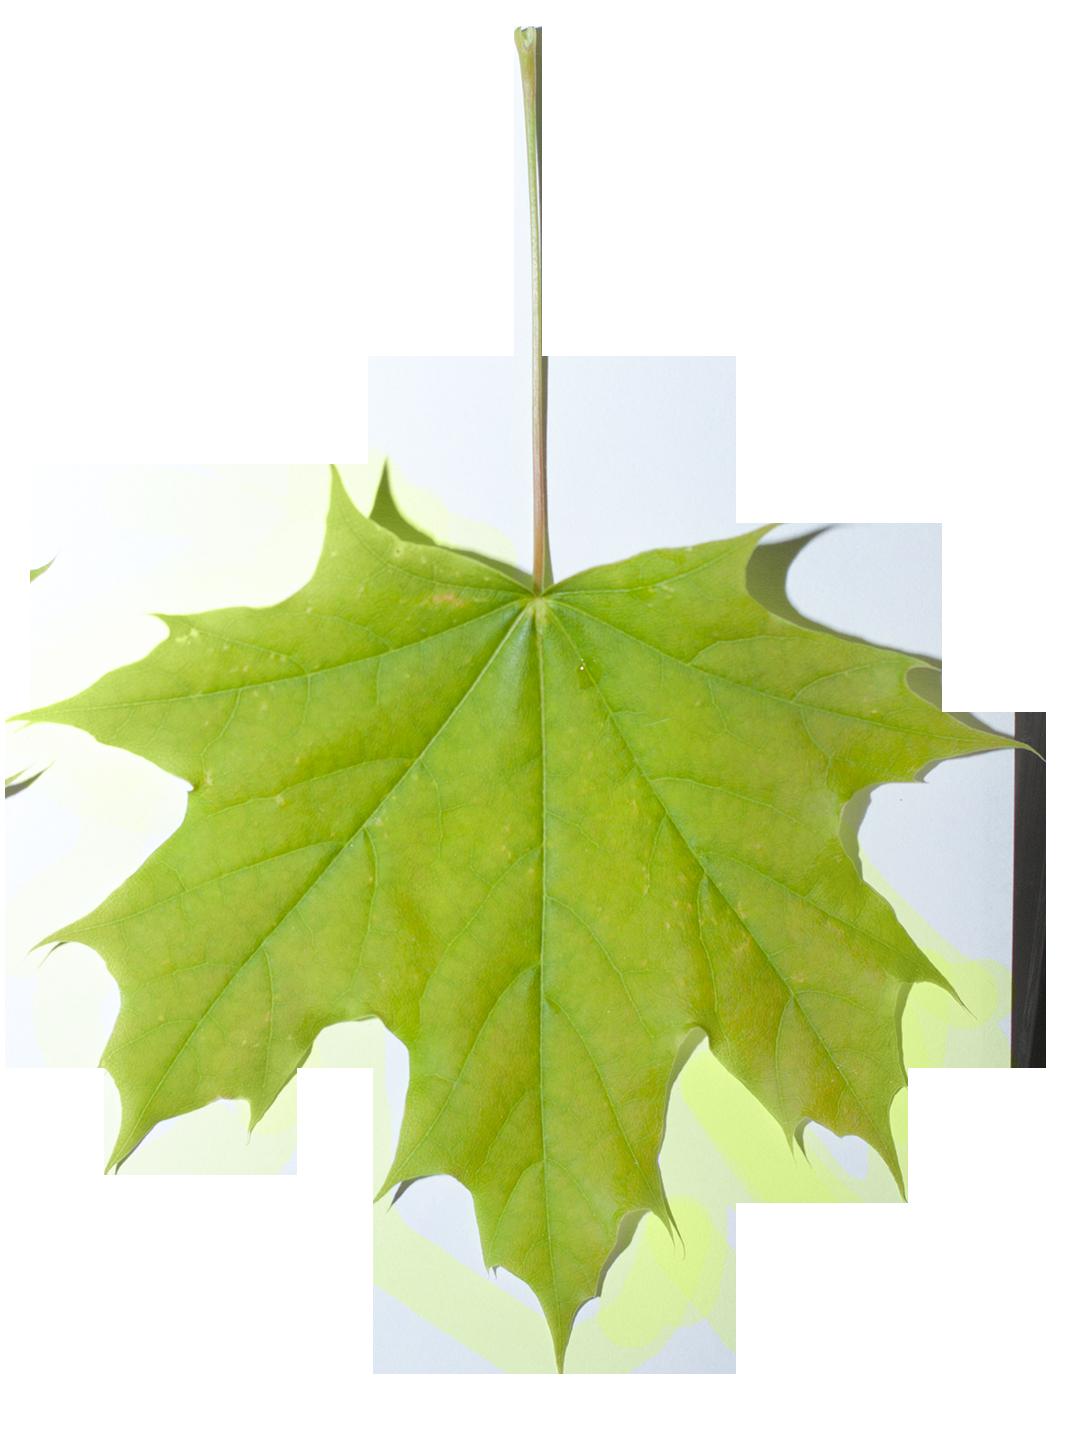 Plants clipart vegetation. Paramecij s base texture